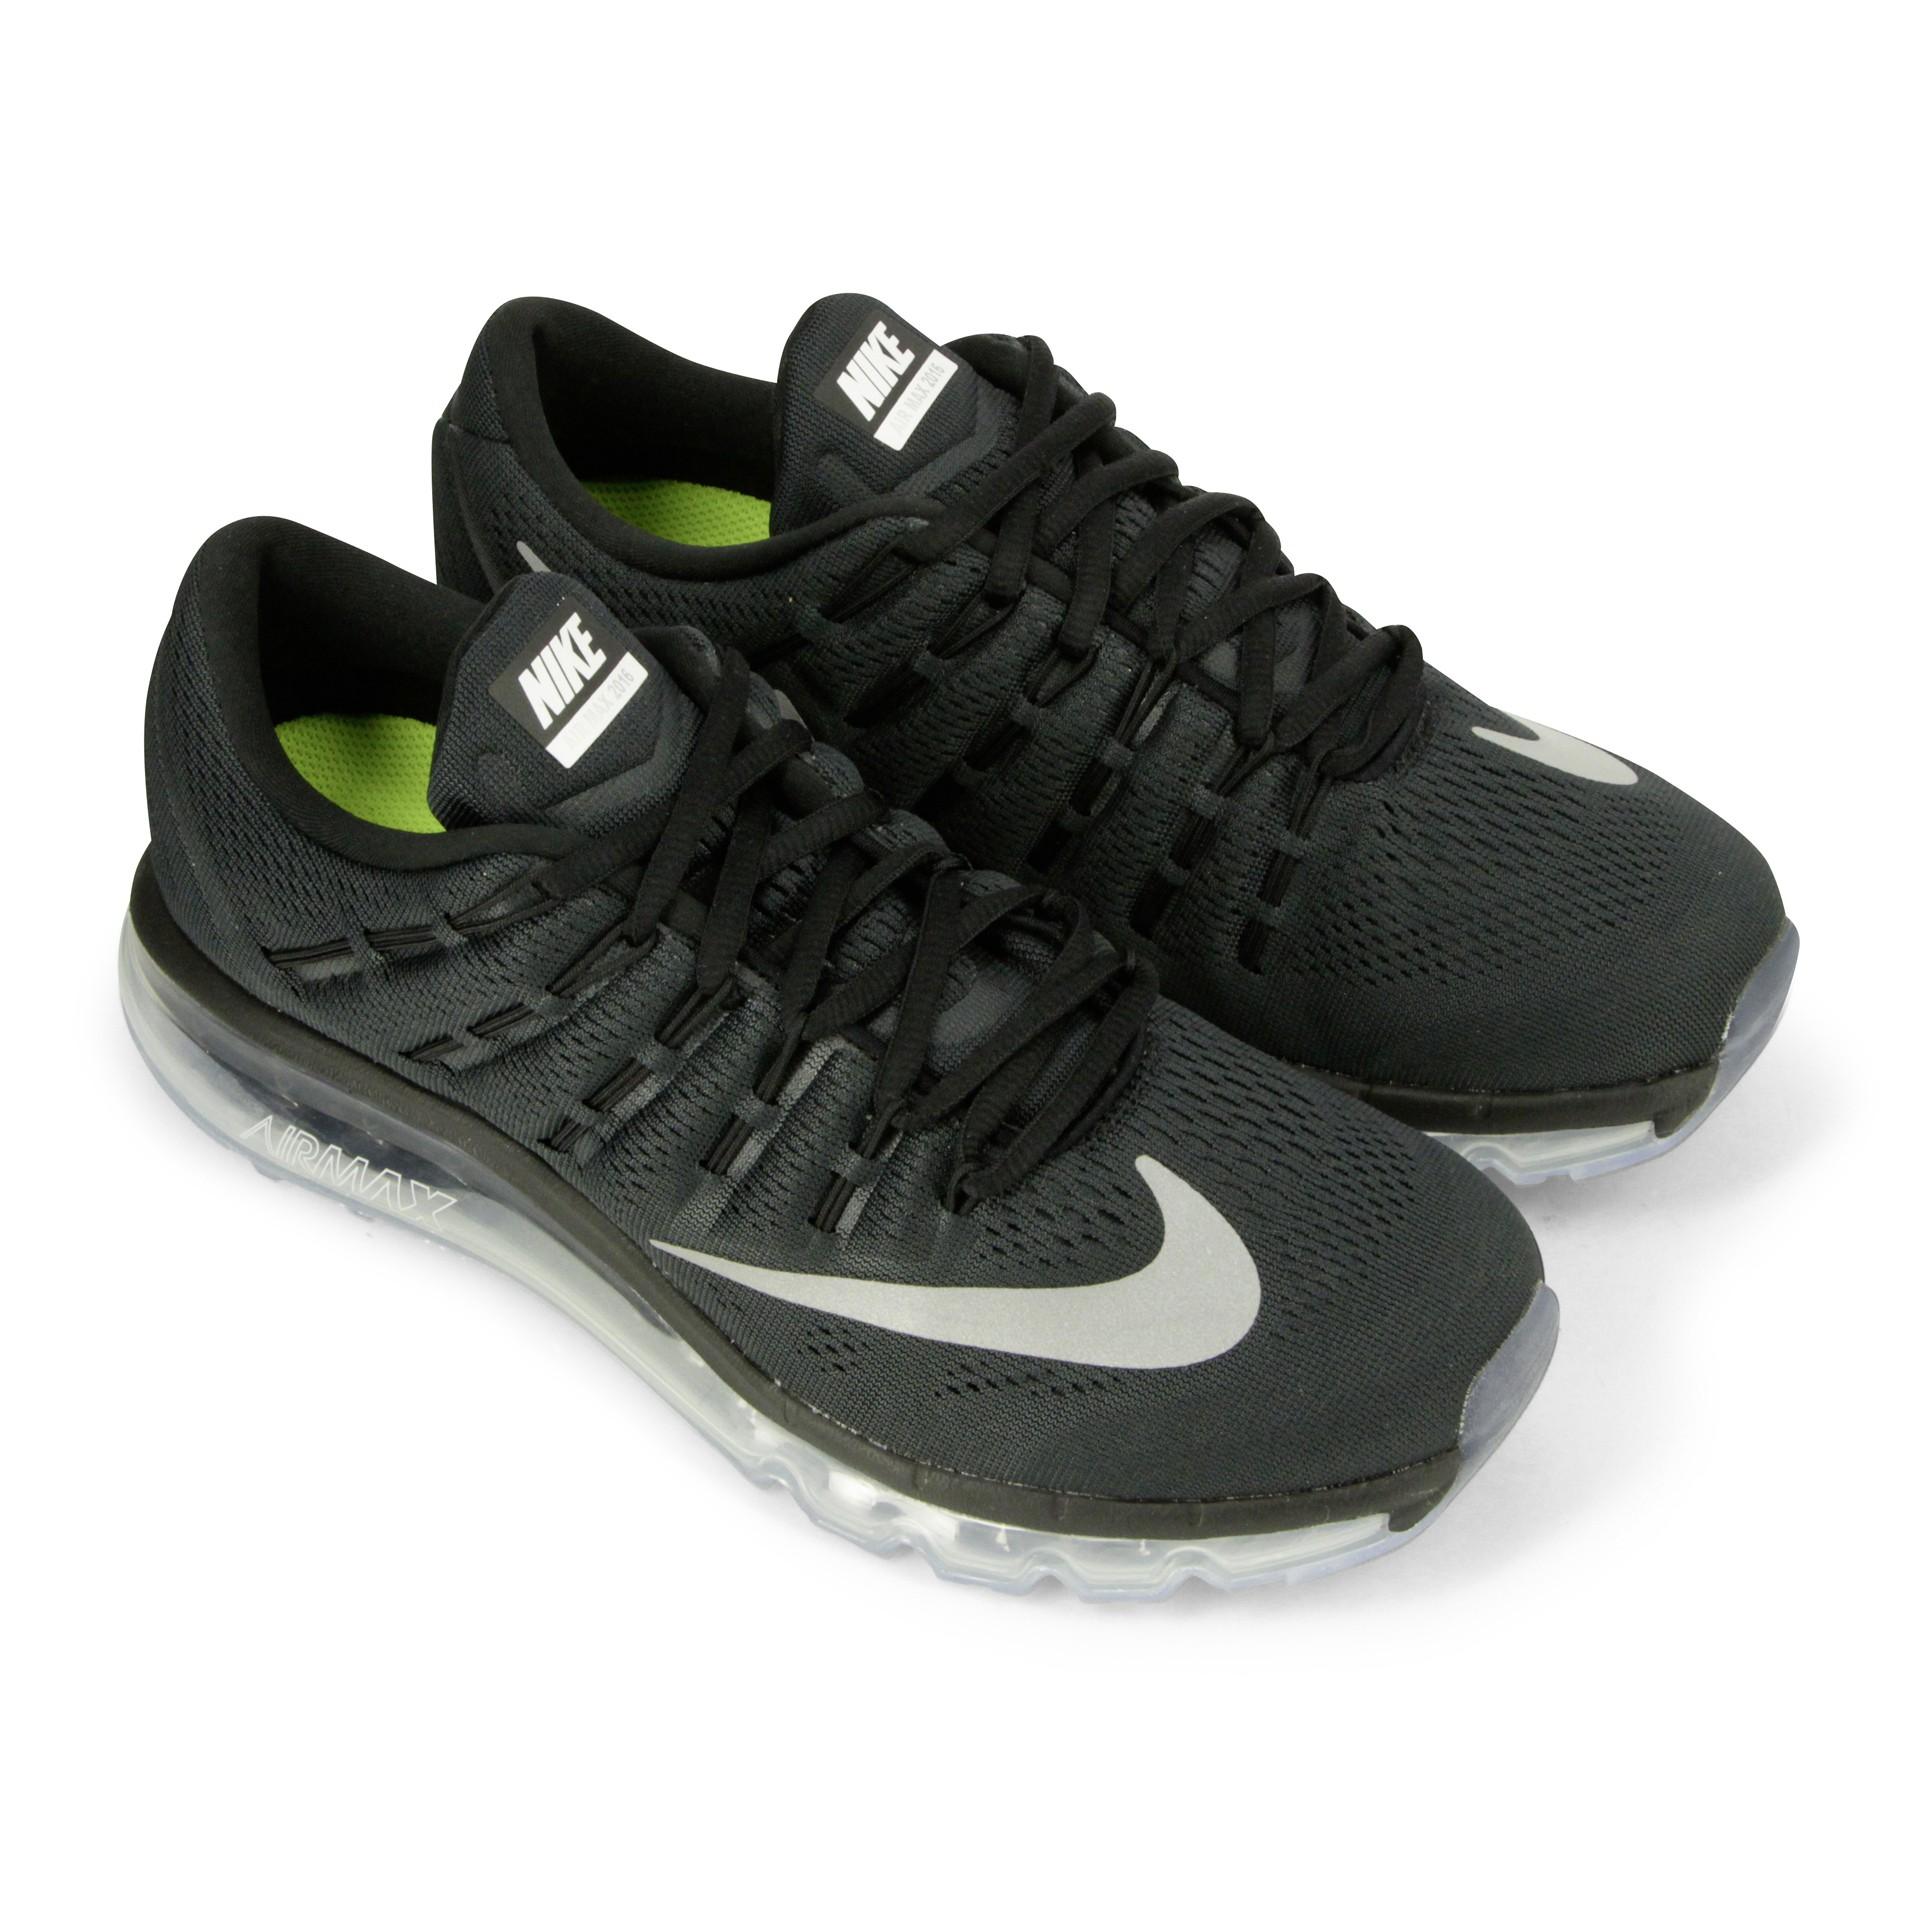 prix compétitif 4b8f2 5640d Air Max Nike Homme Acheter Courir BCodeWrQx